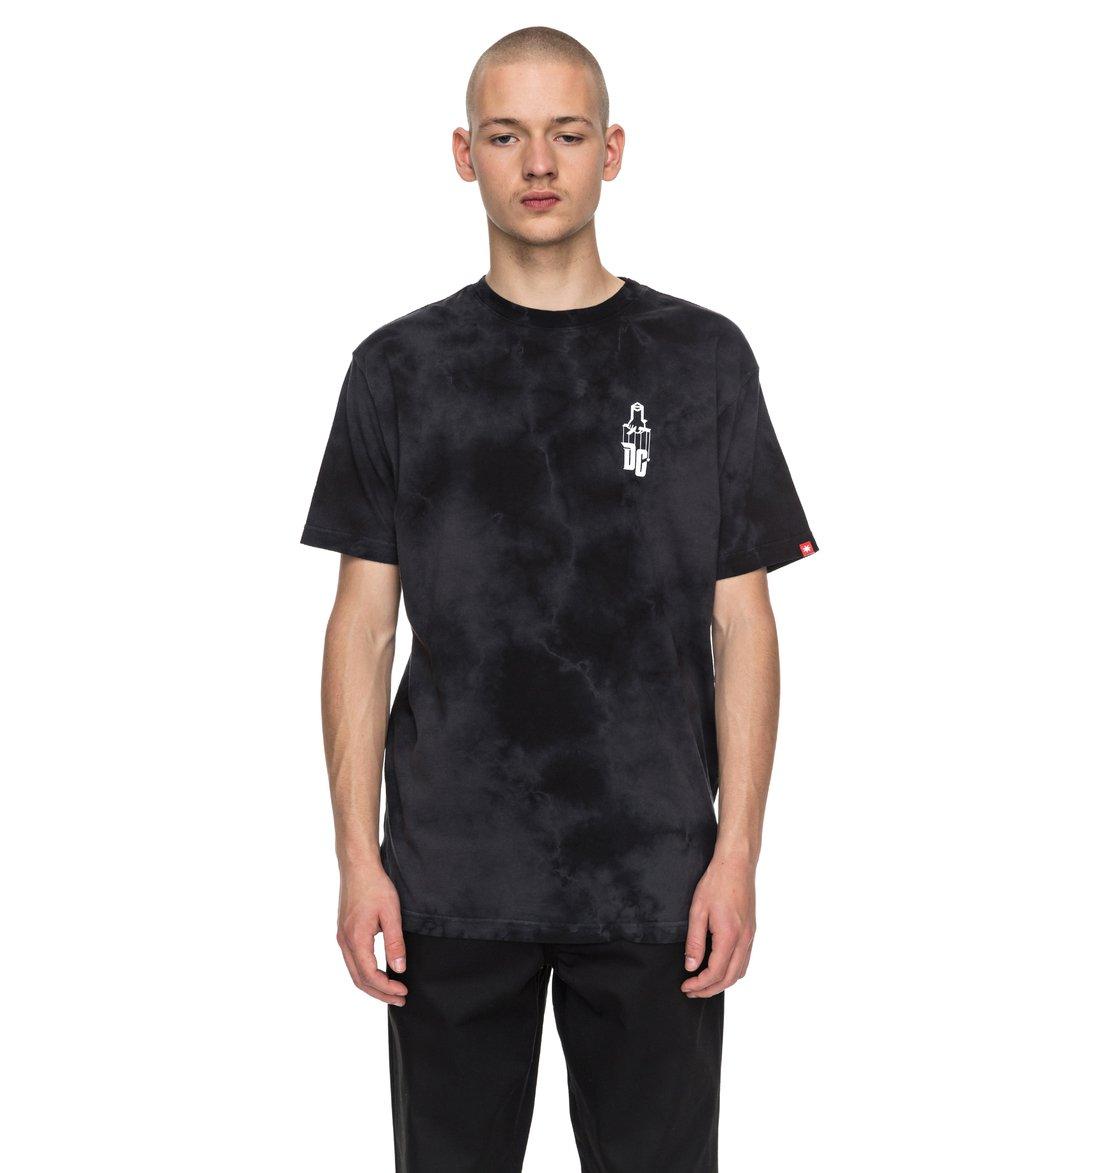 Tee Shirt Sk8 Mafia Texture Black - DC Shoes